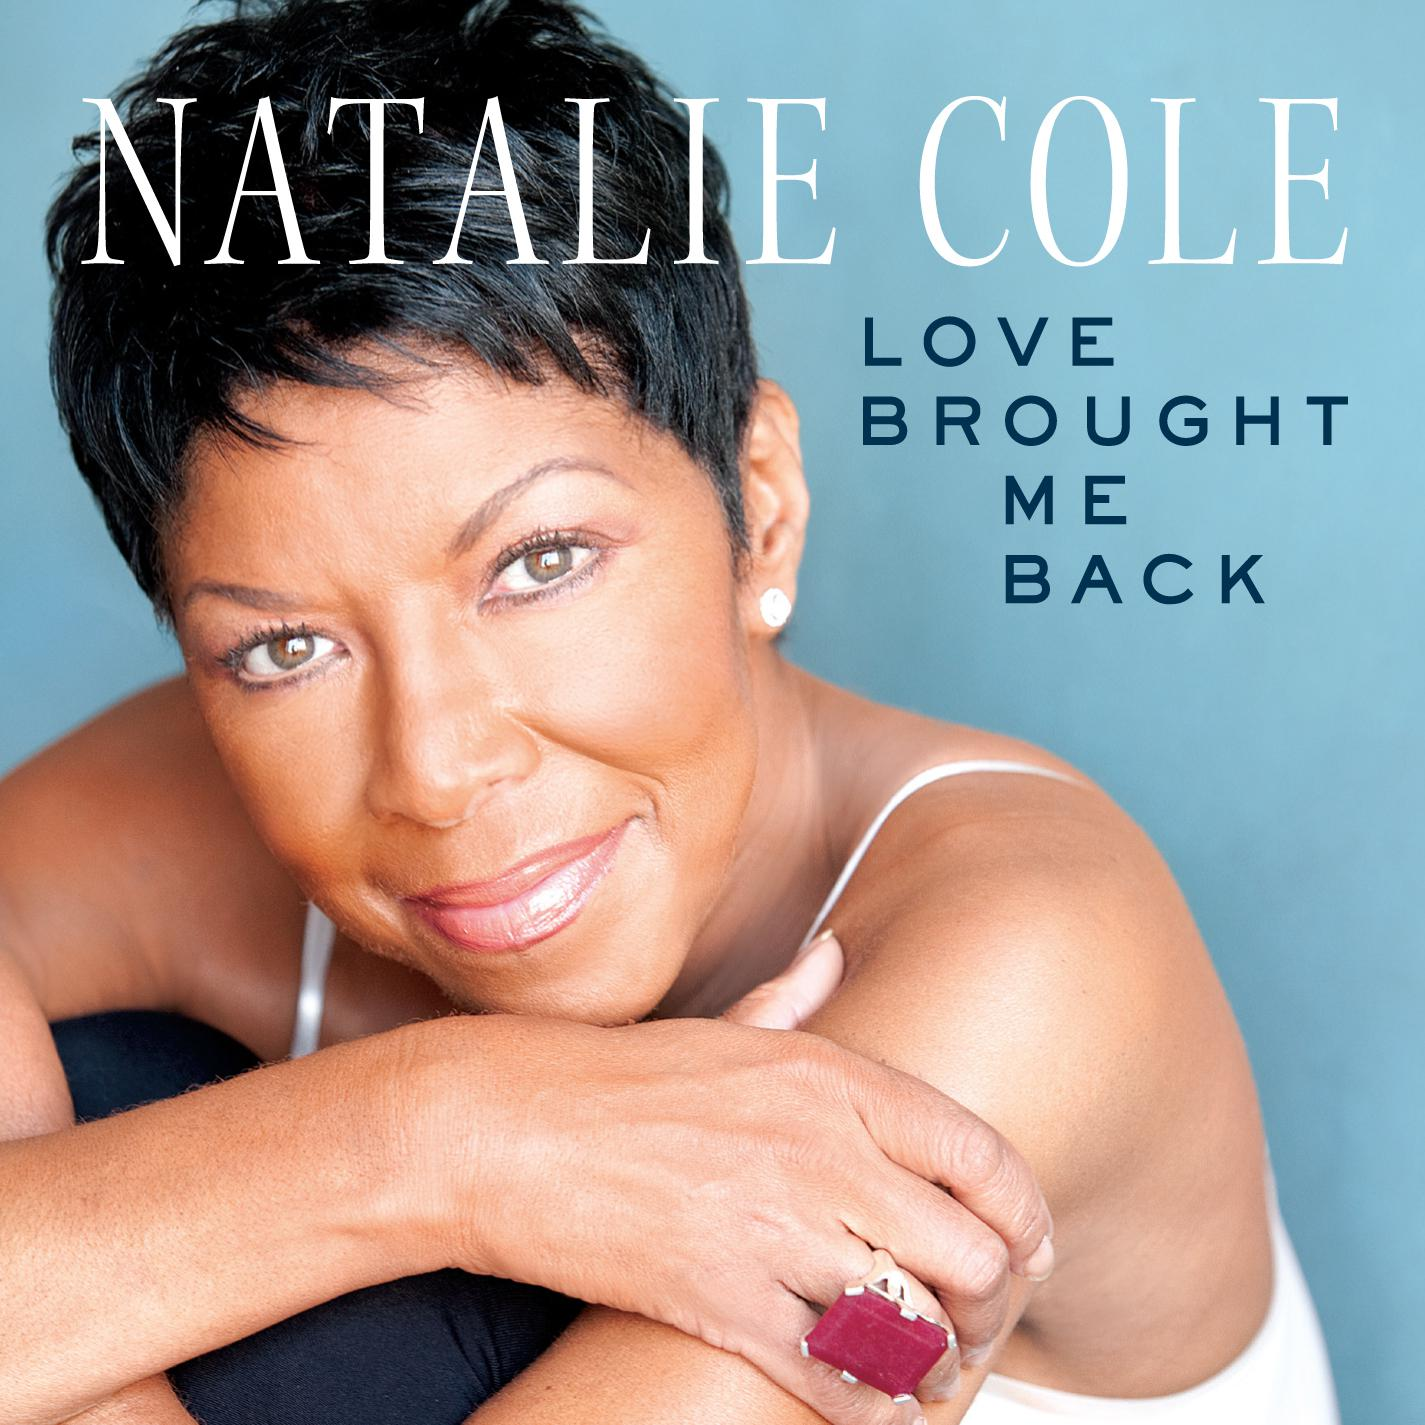 Nat king cole, nat king cole - sometimes im happy, video, single, teaser